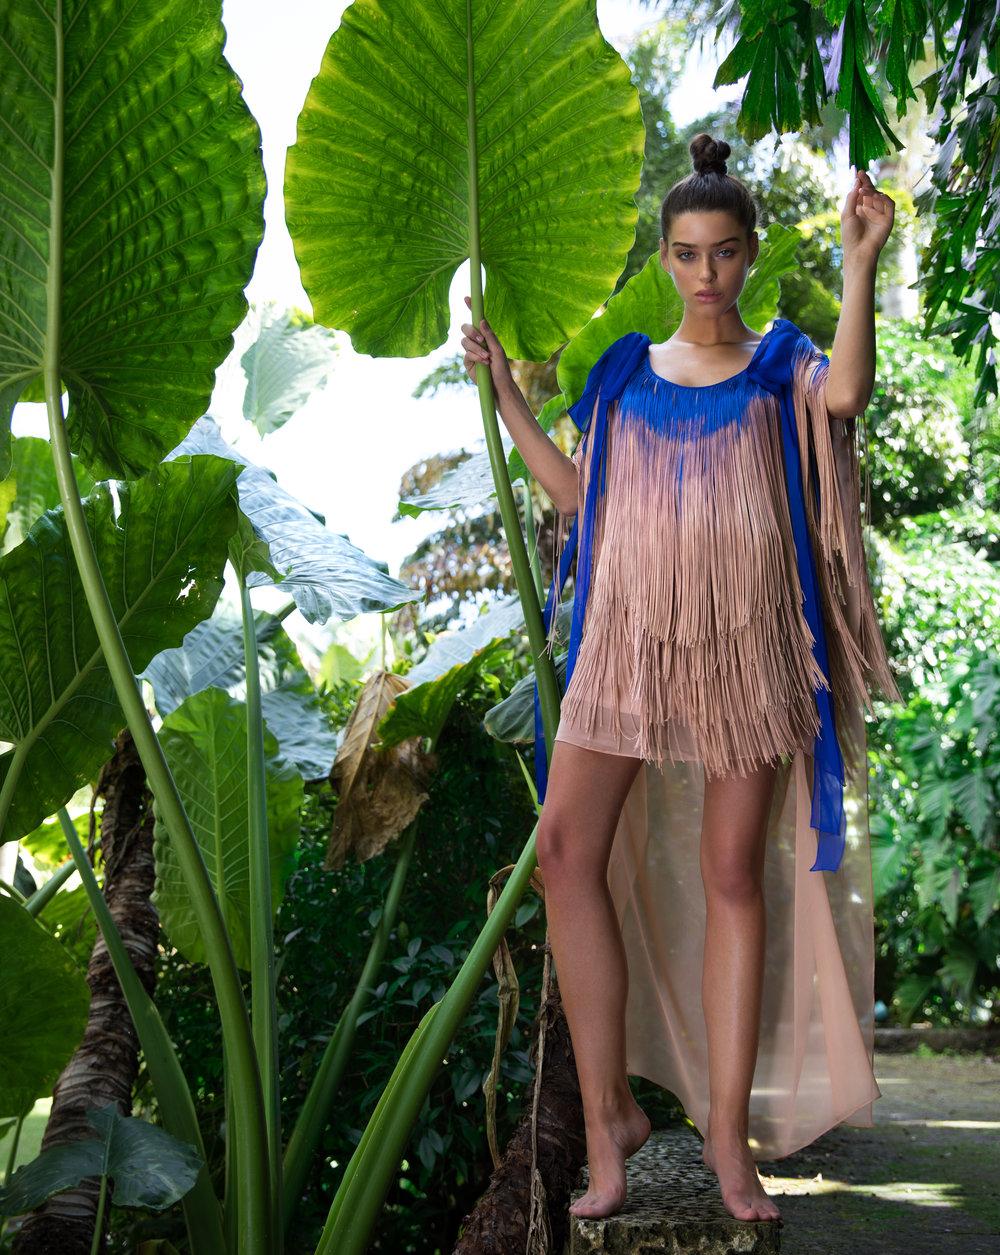 tropicalgarden2.jpg